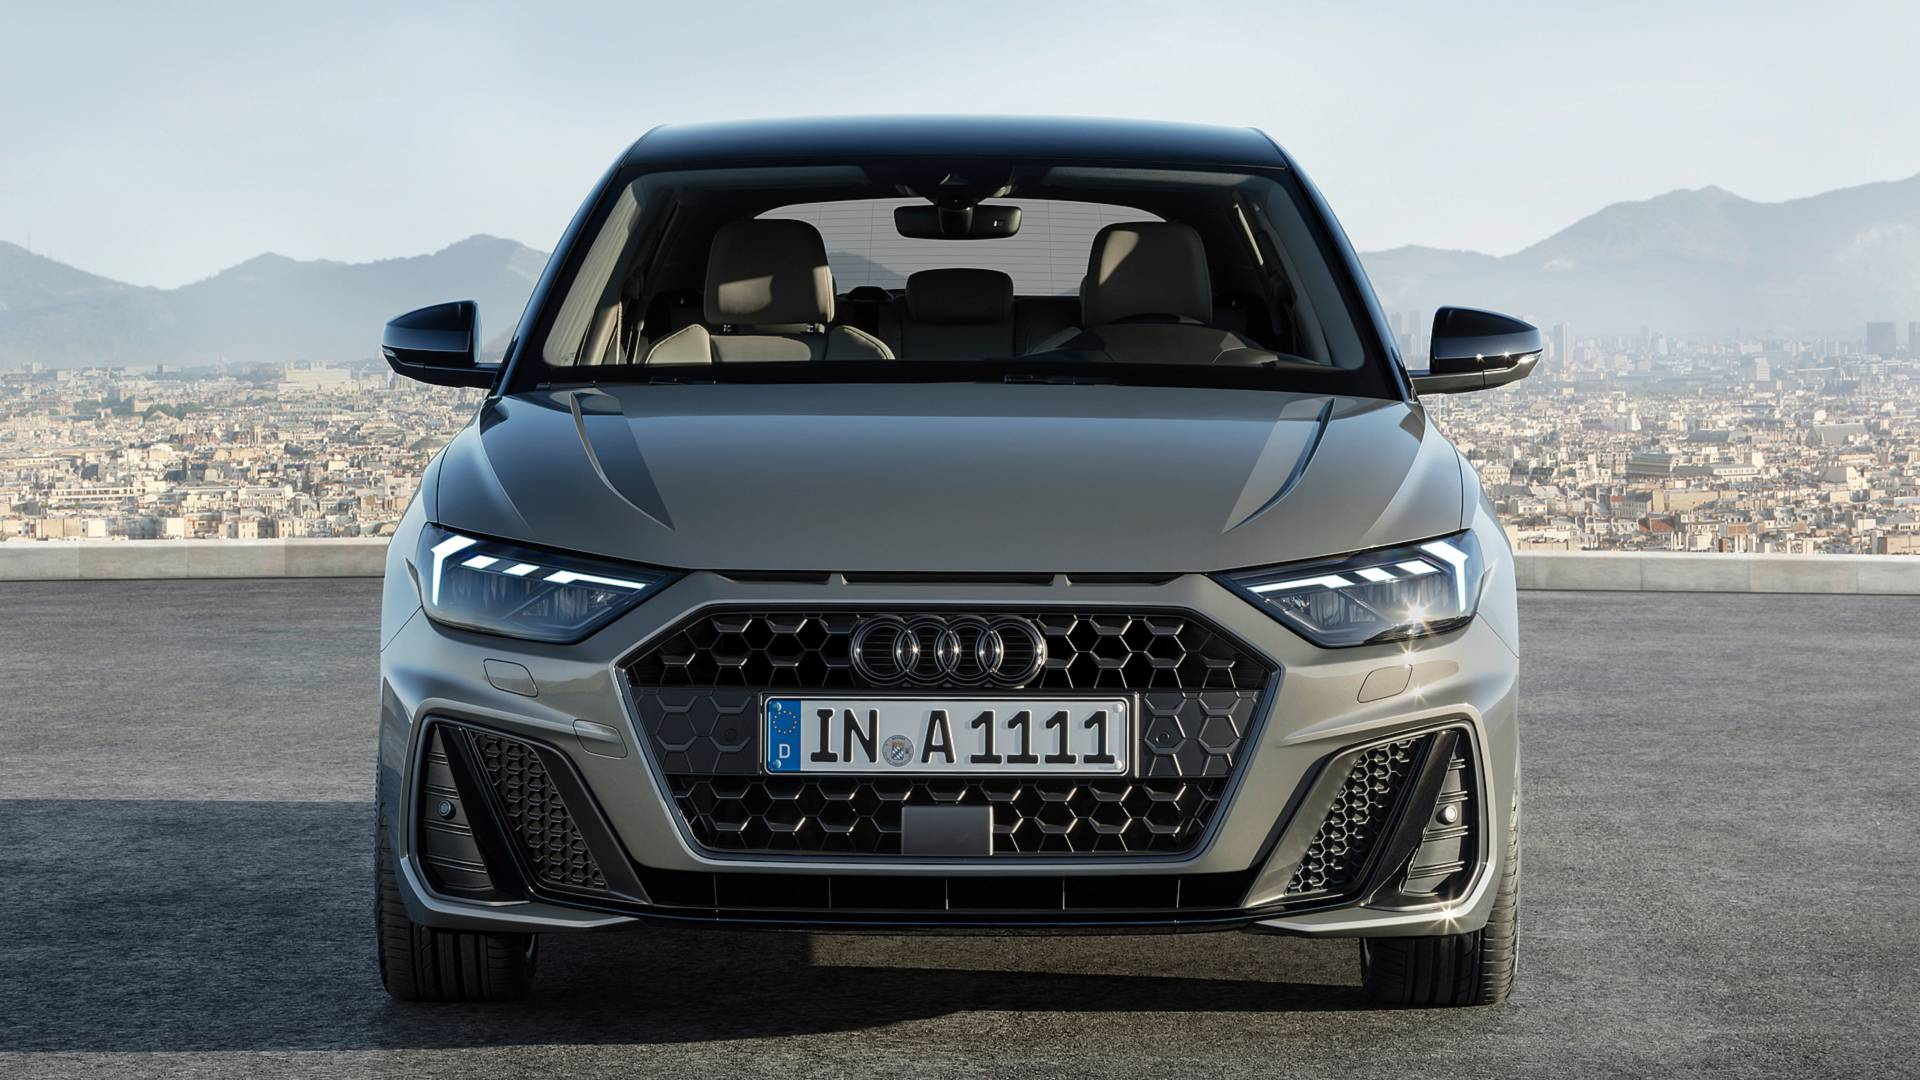 2019 Audi A1 Sportback Revealed, 40 TFSI Boasts 2.0-liter Engine With 200 PS - autoevolution